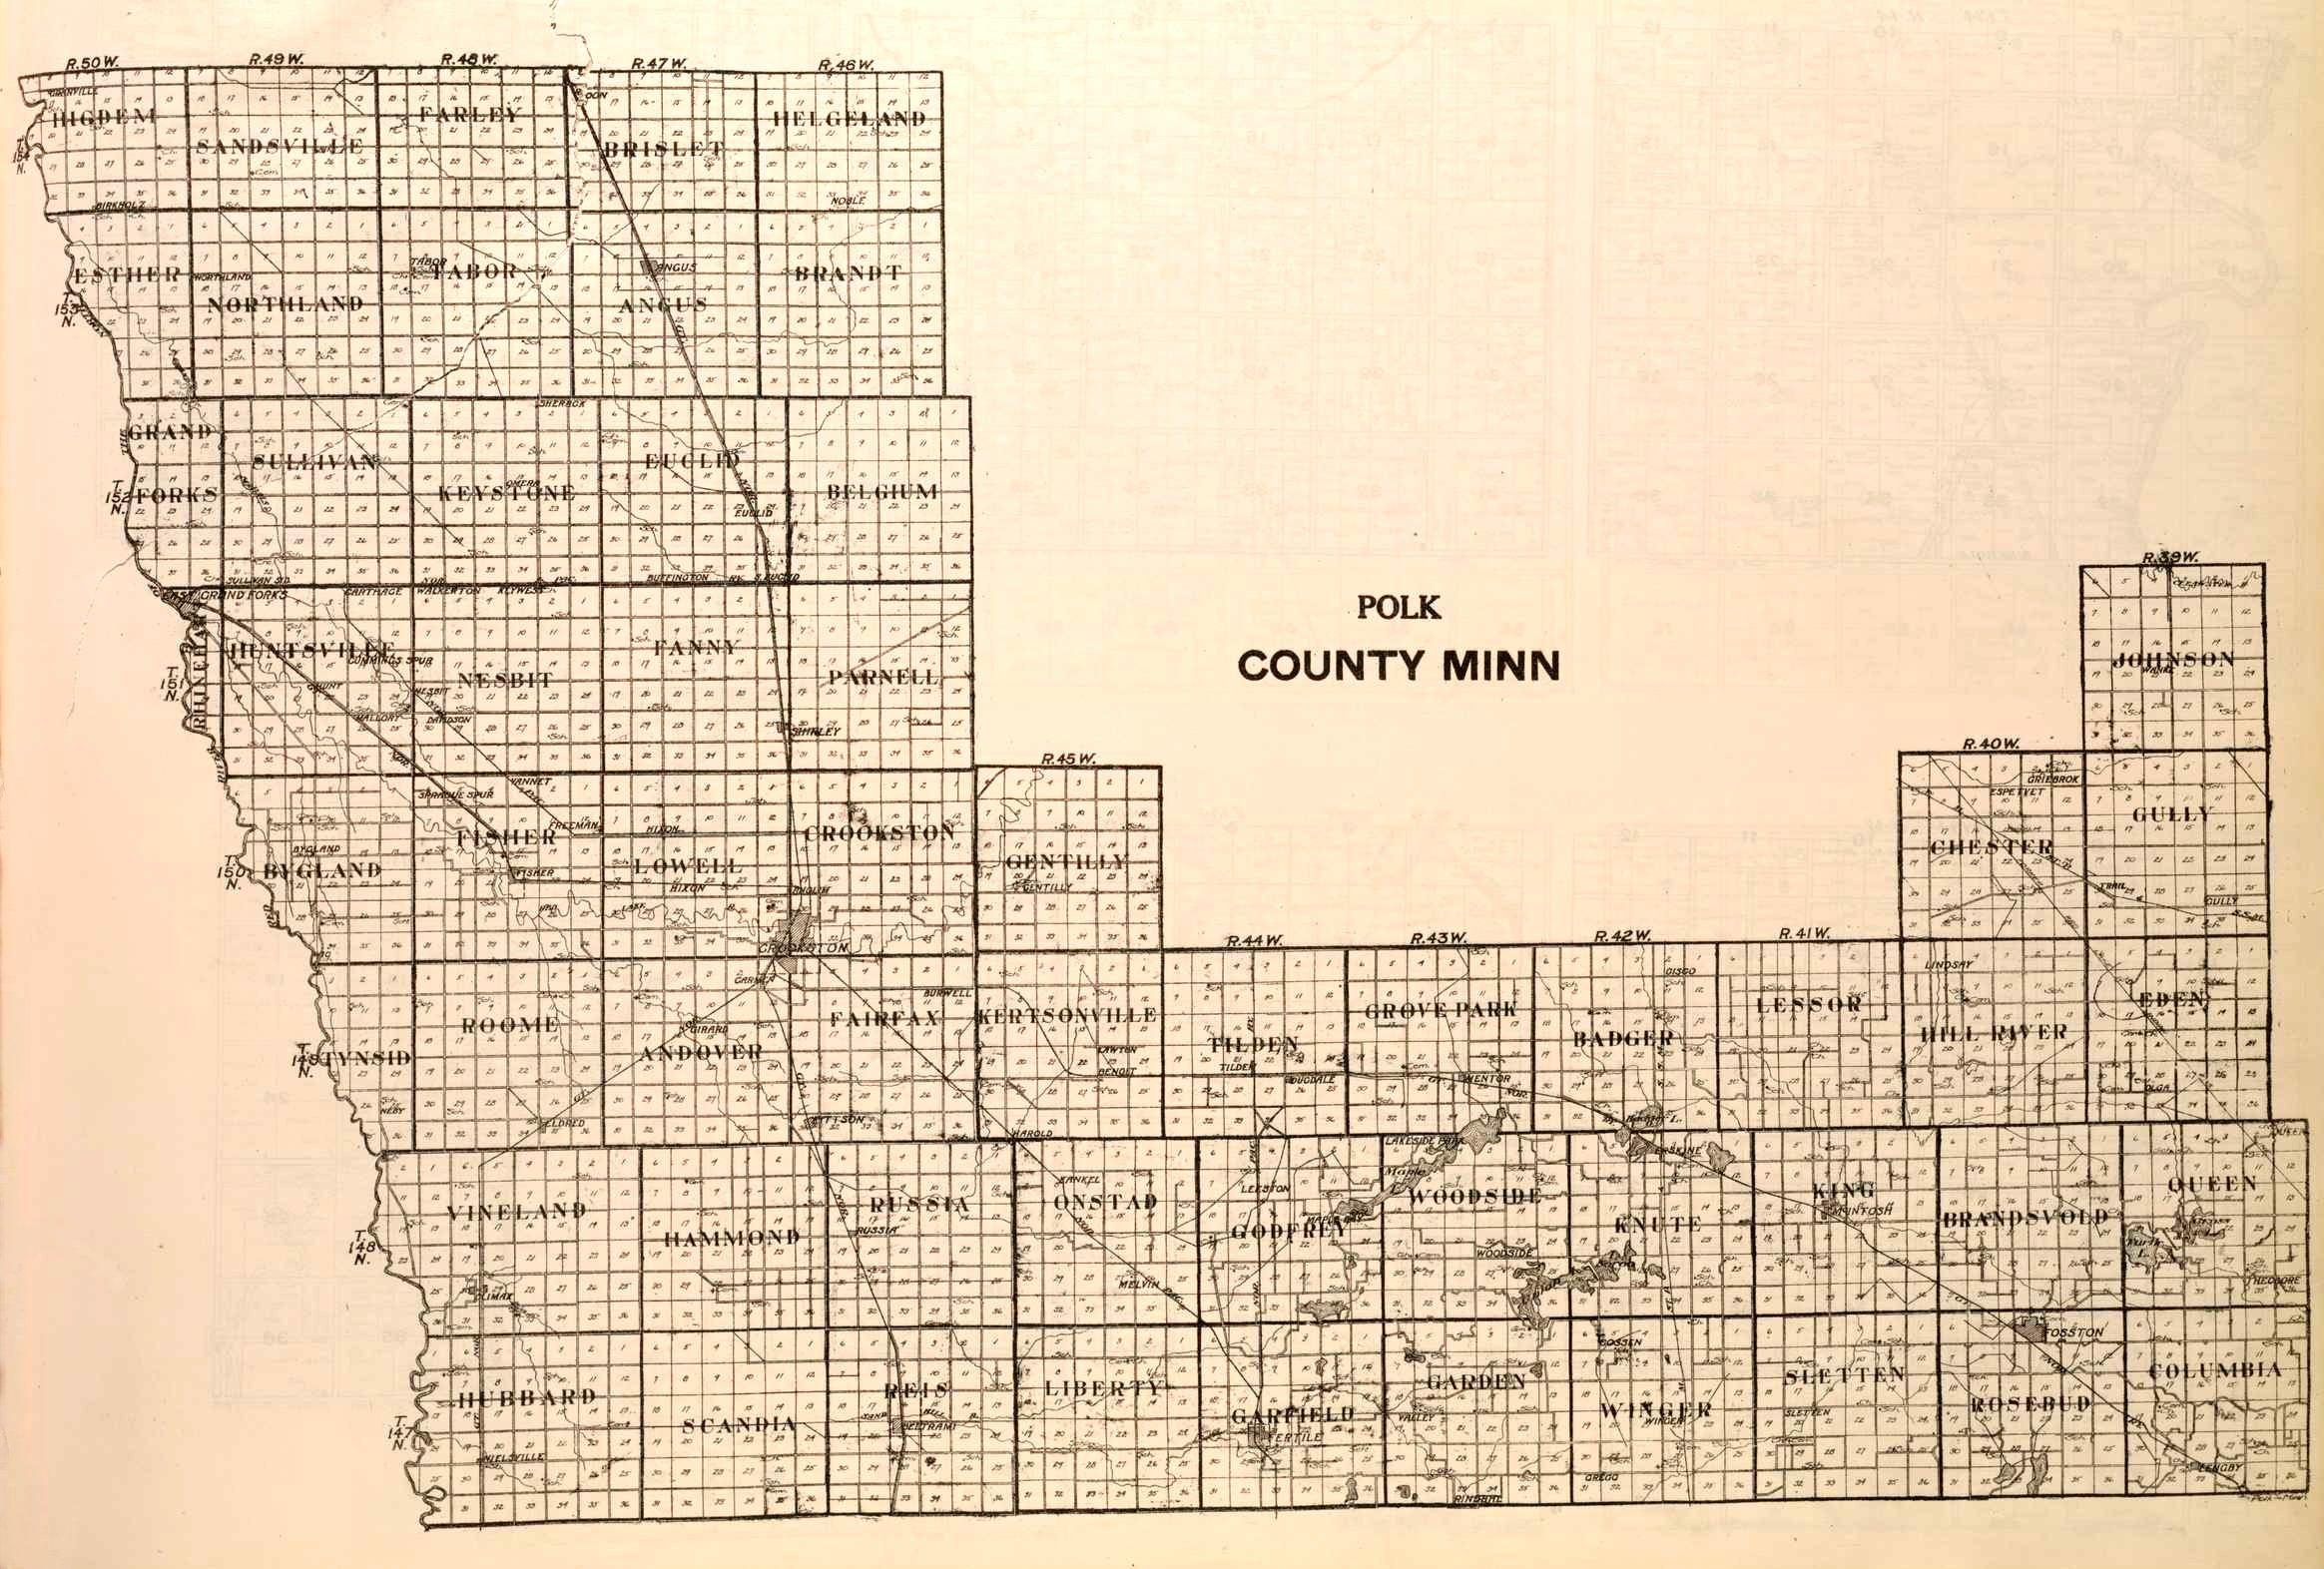 Polk County Minnesota Map - Mn county map